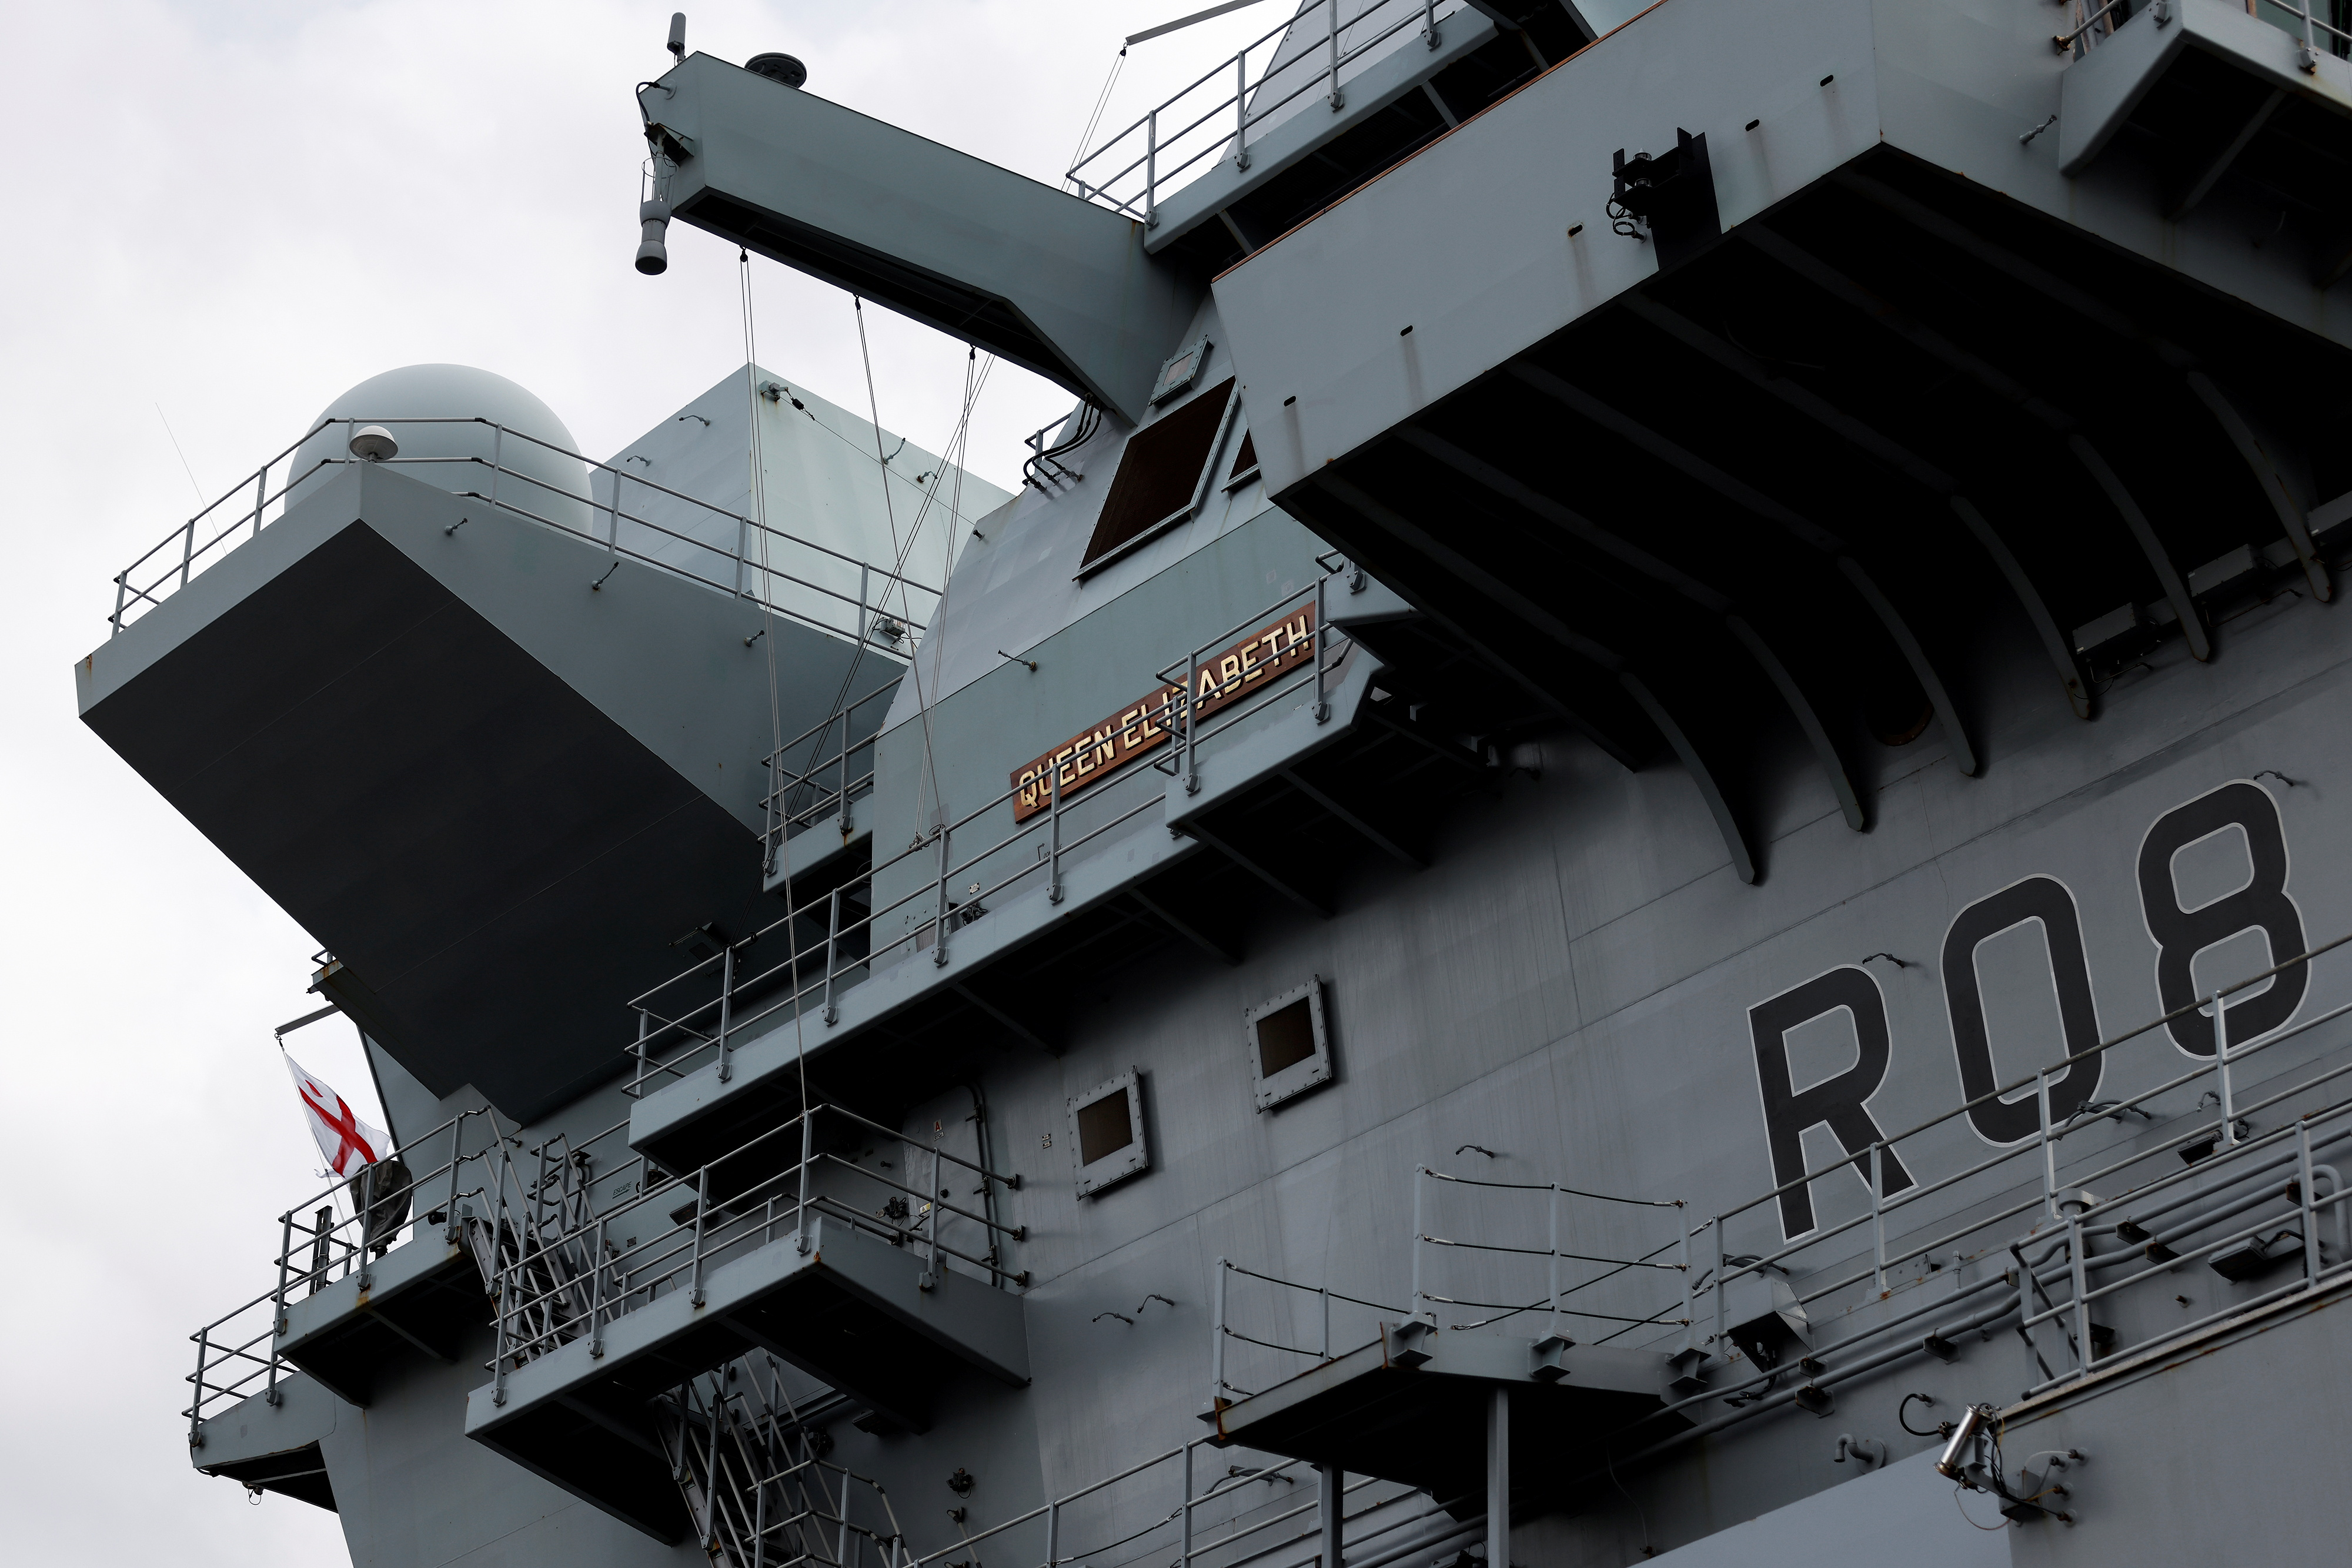 A view of the British Royal Navy's HMS Queen Elizabeth aircraft carrier at the U.S. naval base in Yokosuka, Kanagawa Prefecture, Japan September 6, 2021.  Kiyoshi Ota/Pool via REUTERS